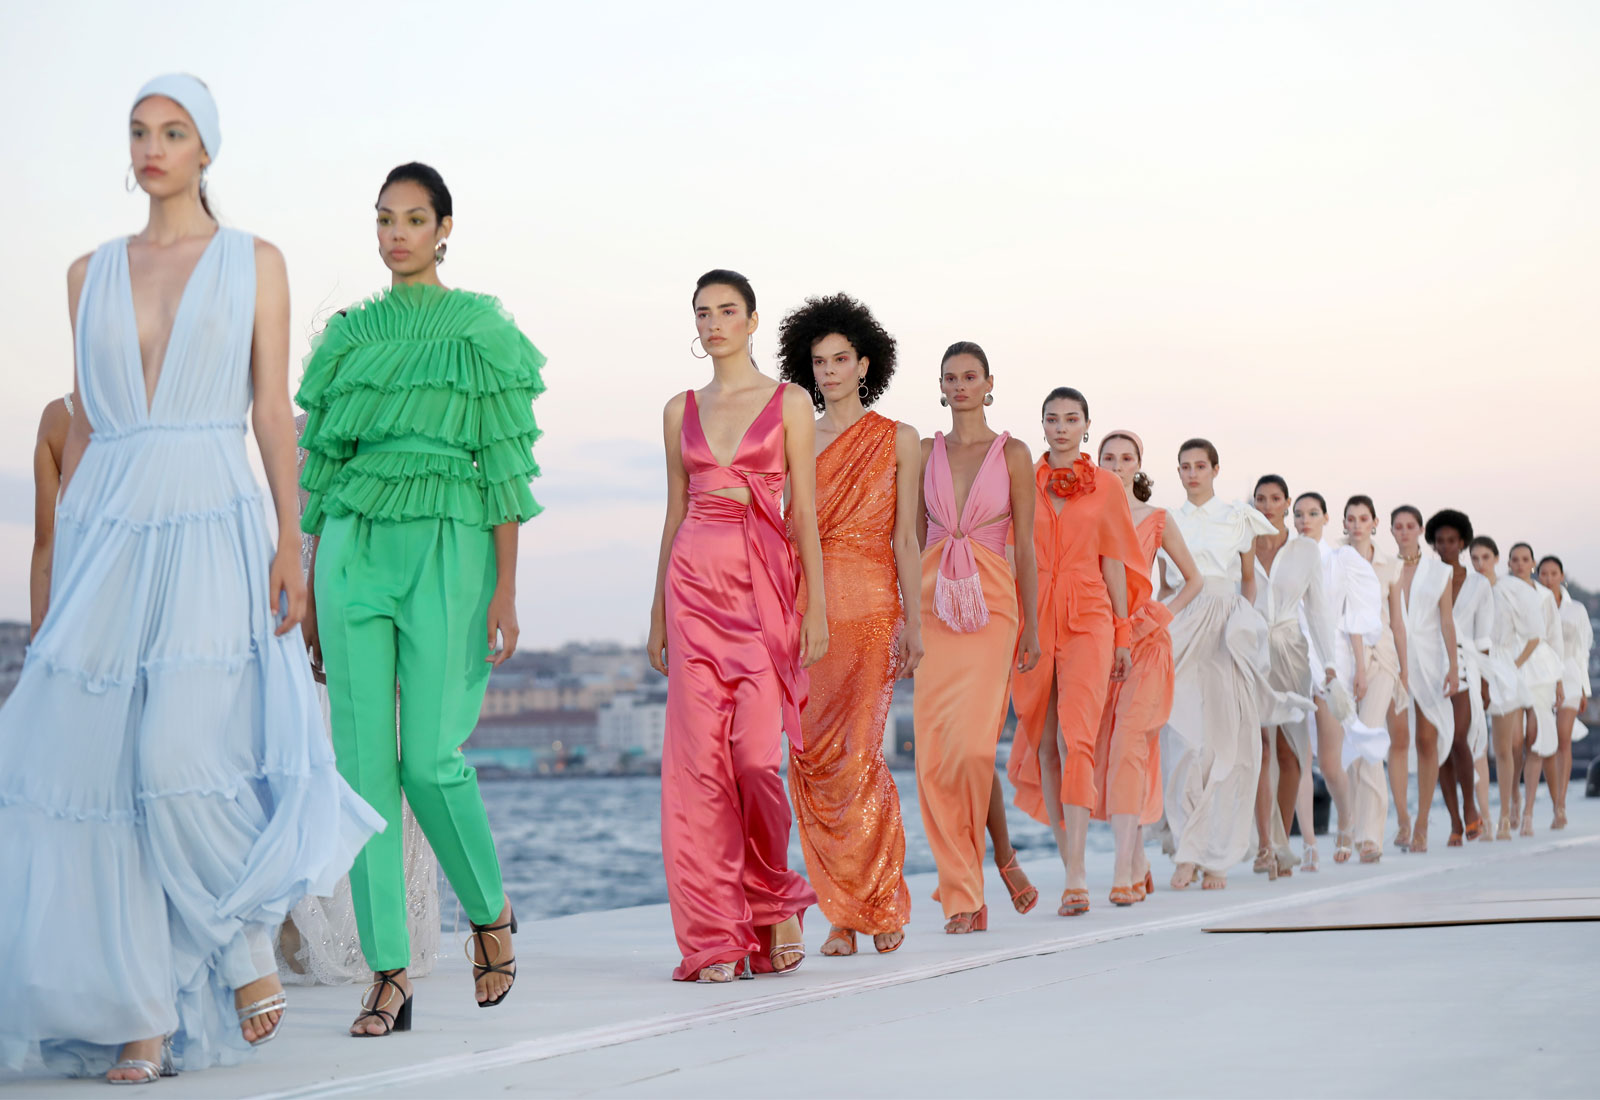 Models walk the runway at Ozgur Masur show in Istanbul